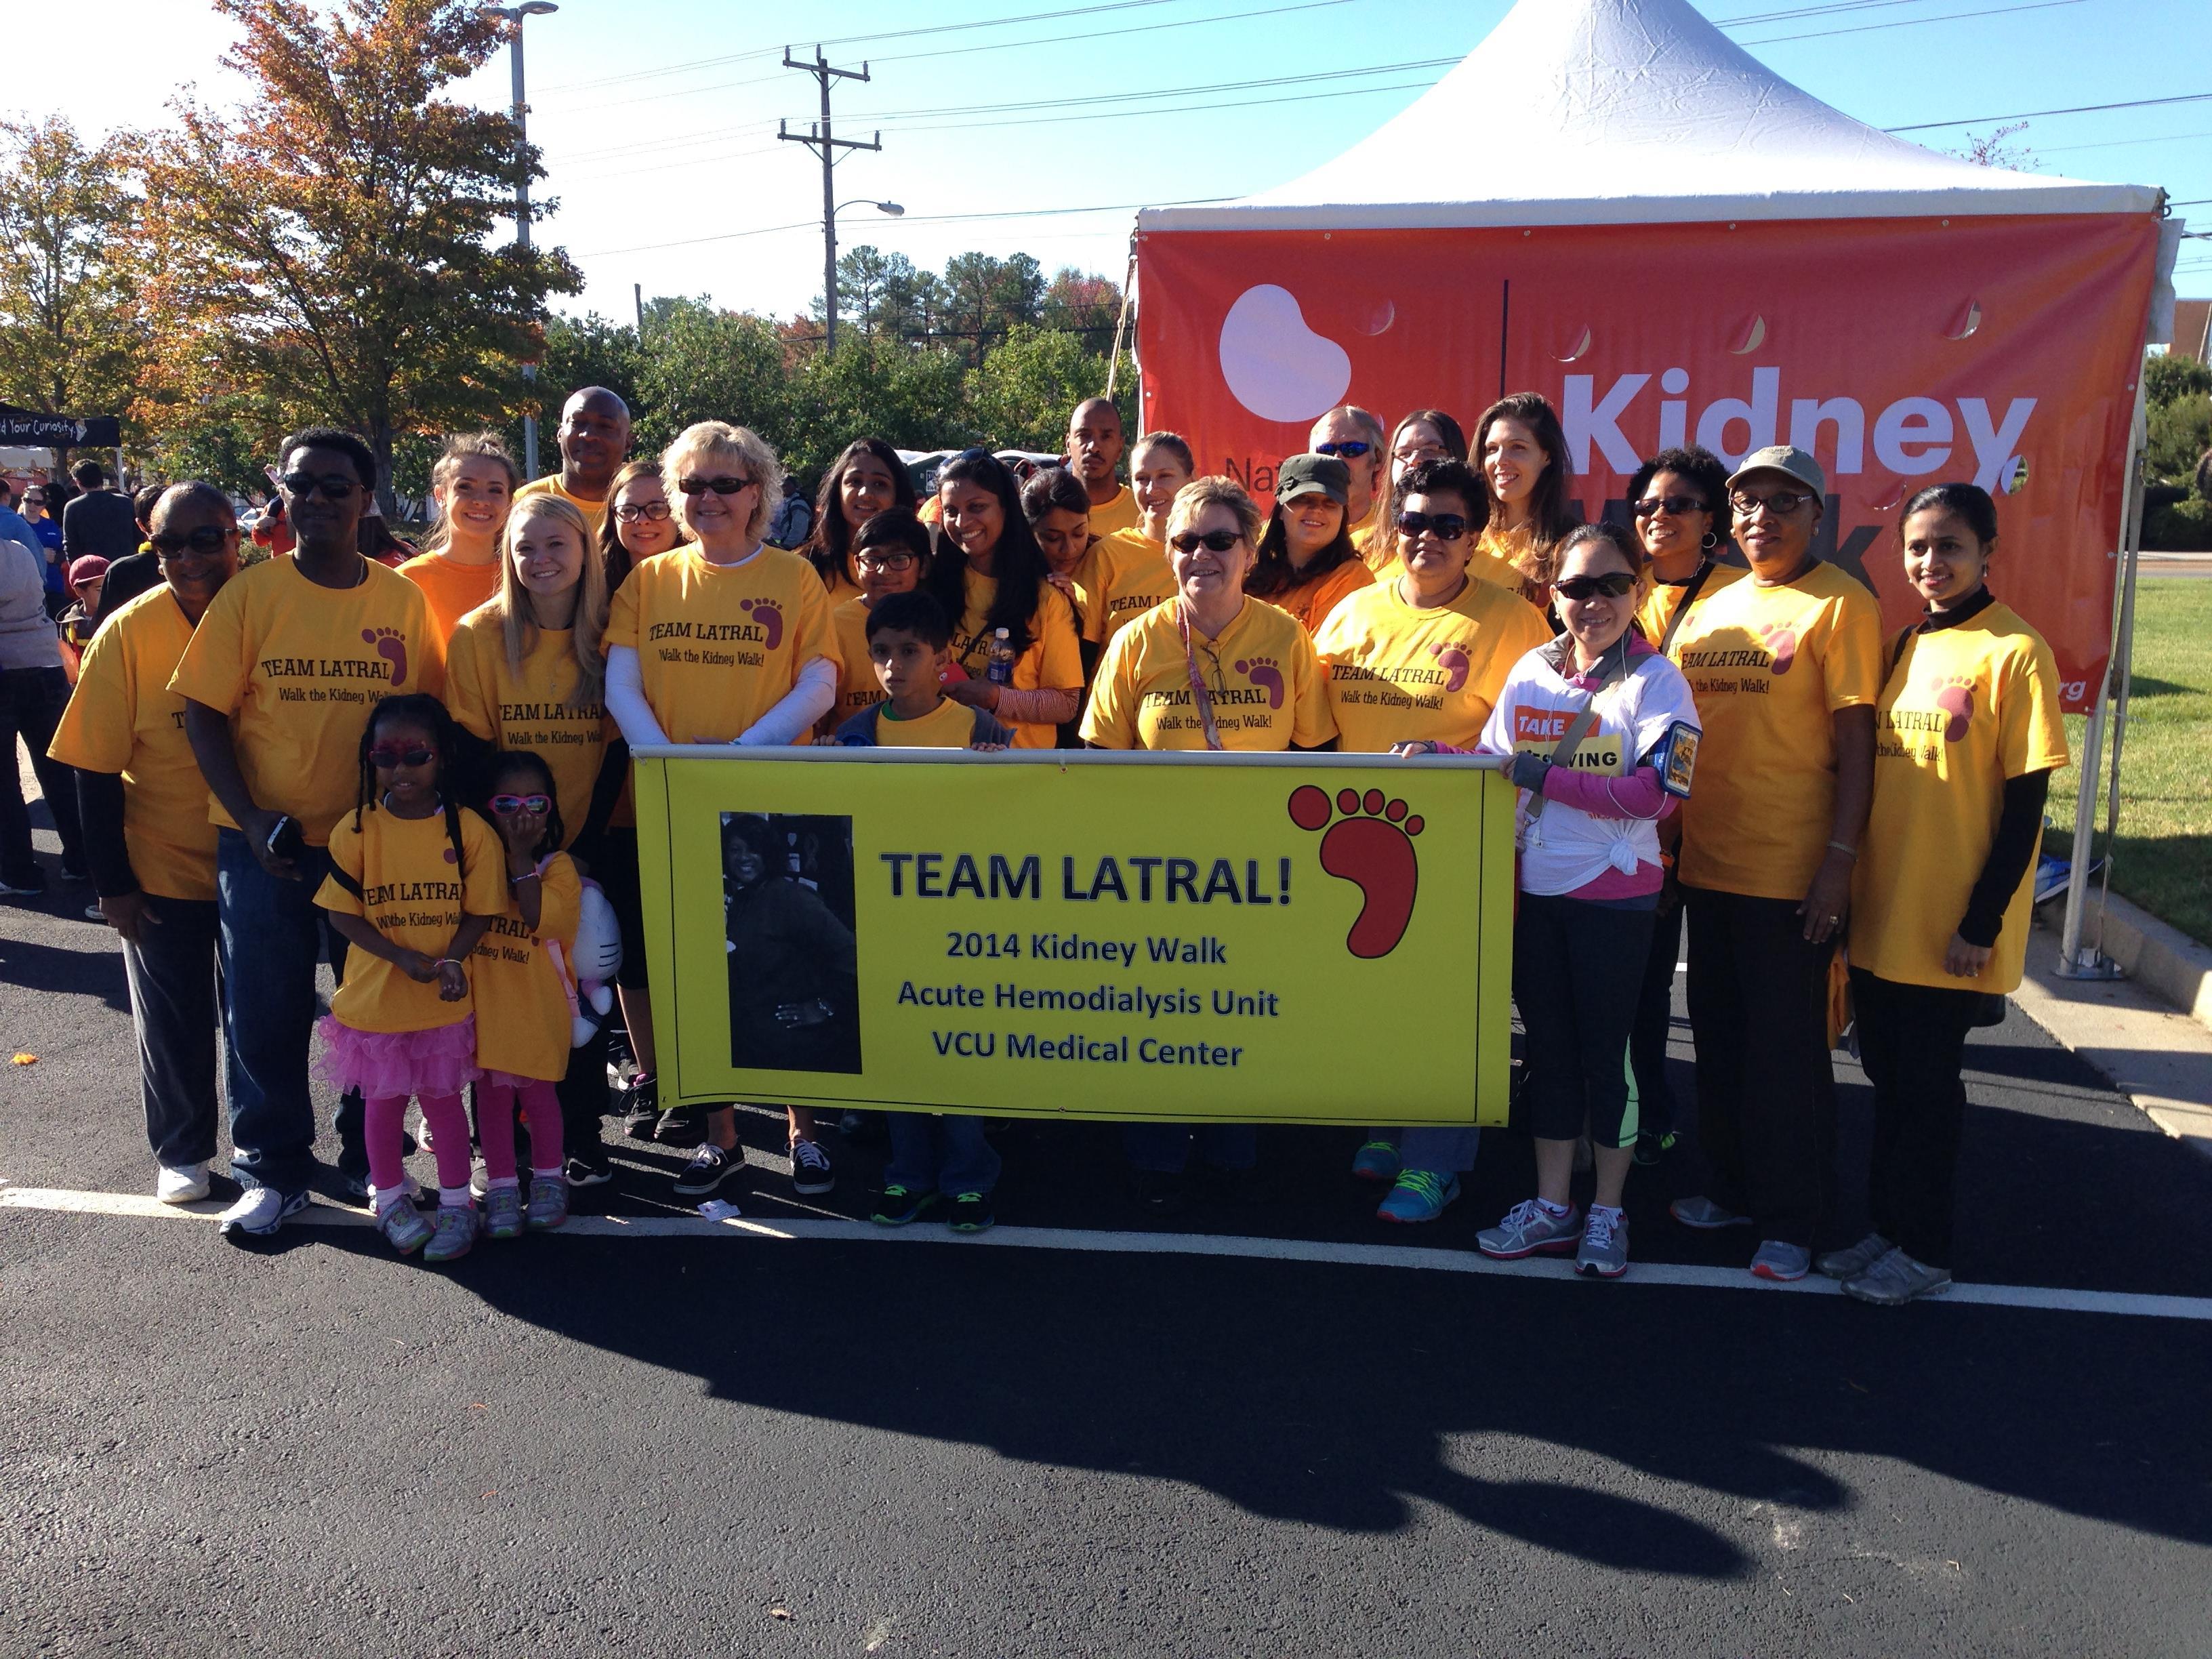 T shirt design richmond va - Team Latral The 2014 Nkf Kidney Walk In Richmond Virginia T Shirt Photo